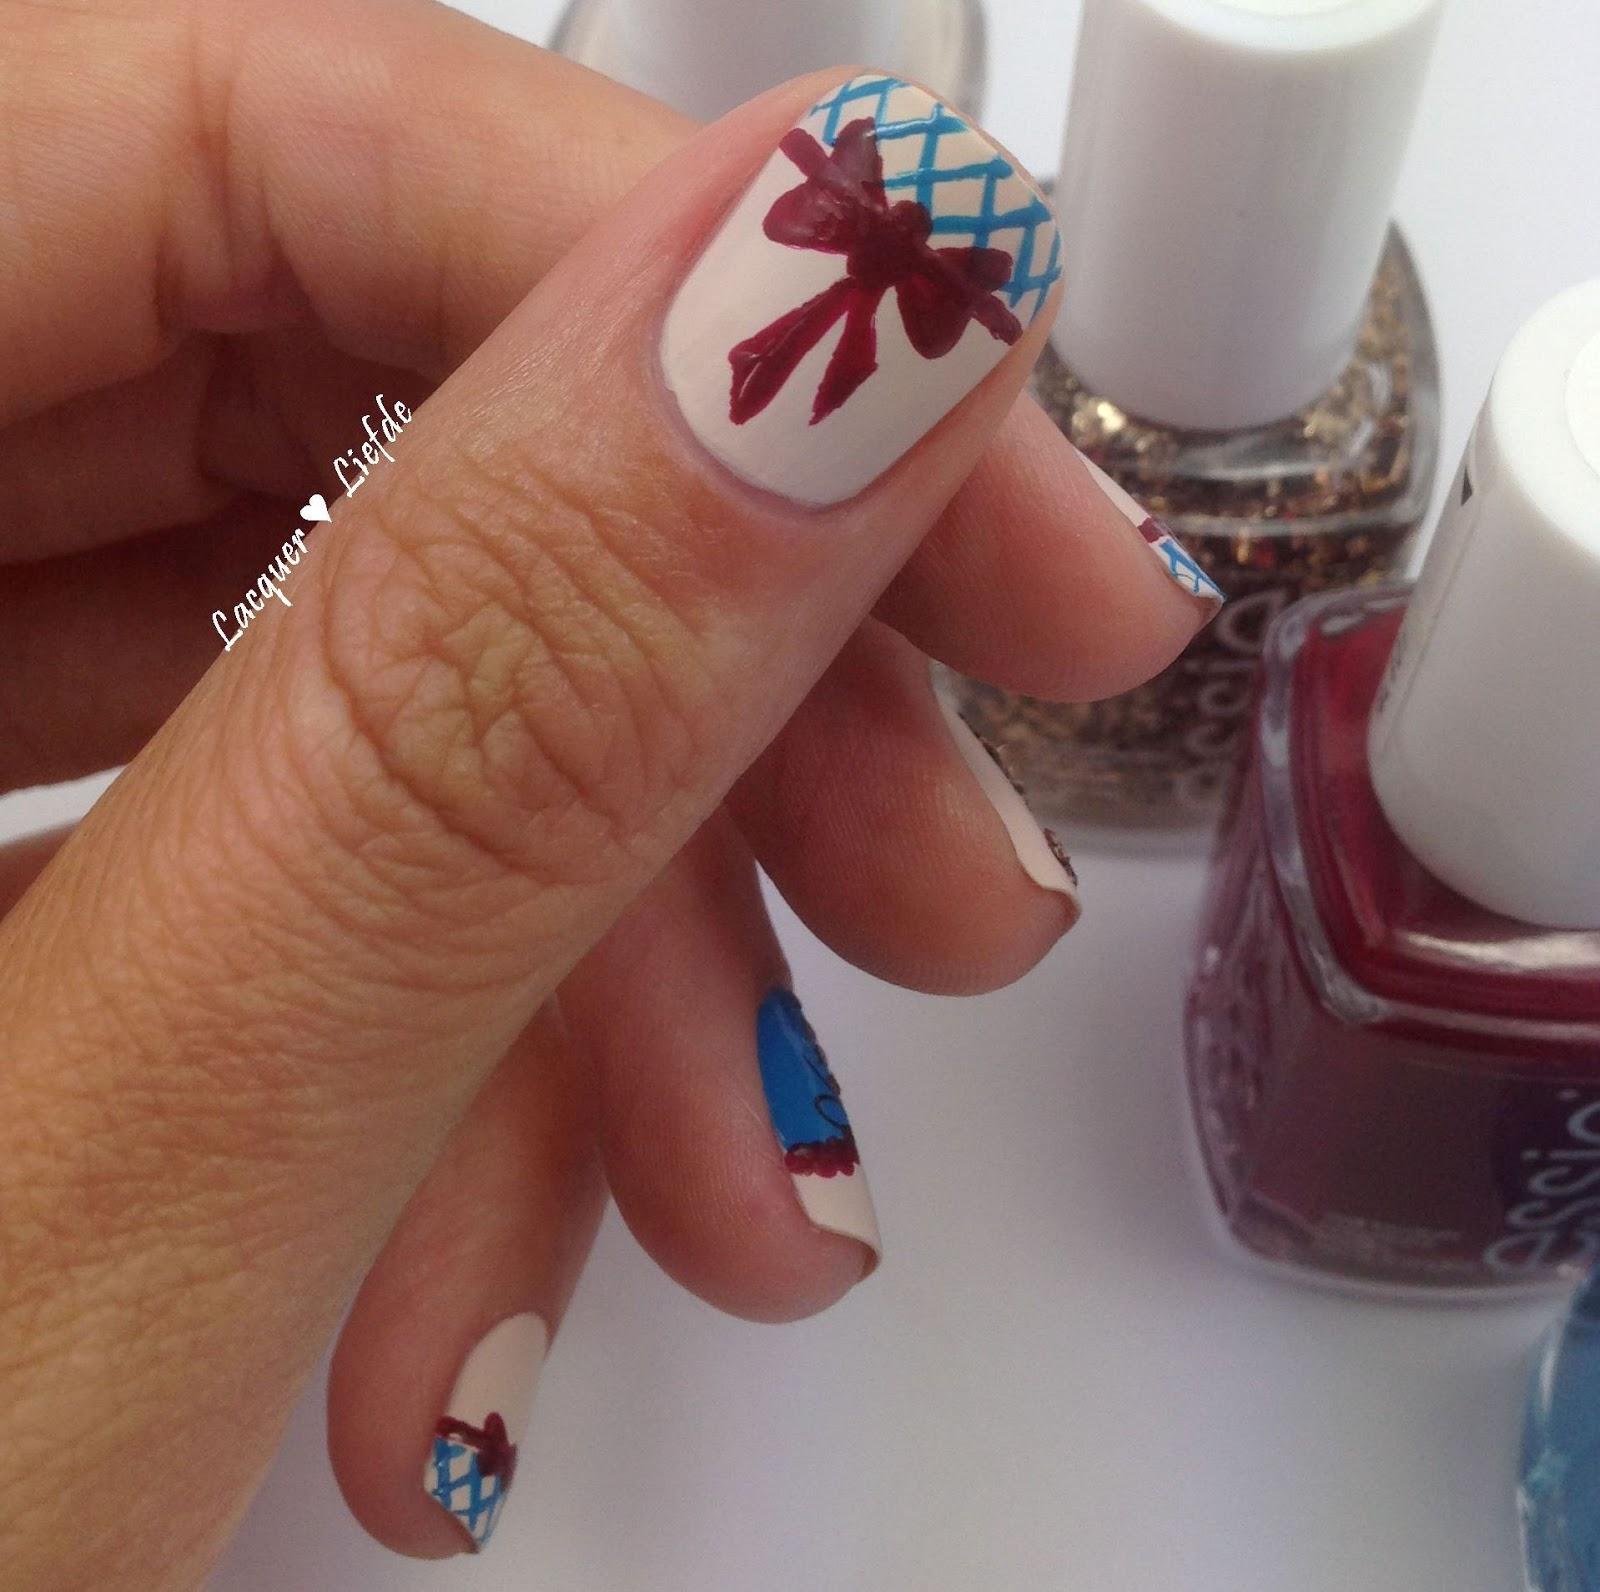 Lacquer ❤ Liefde: Oktoberfest Nail Design No.1